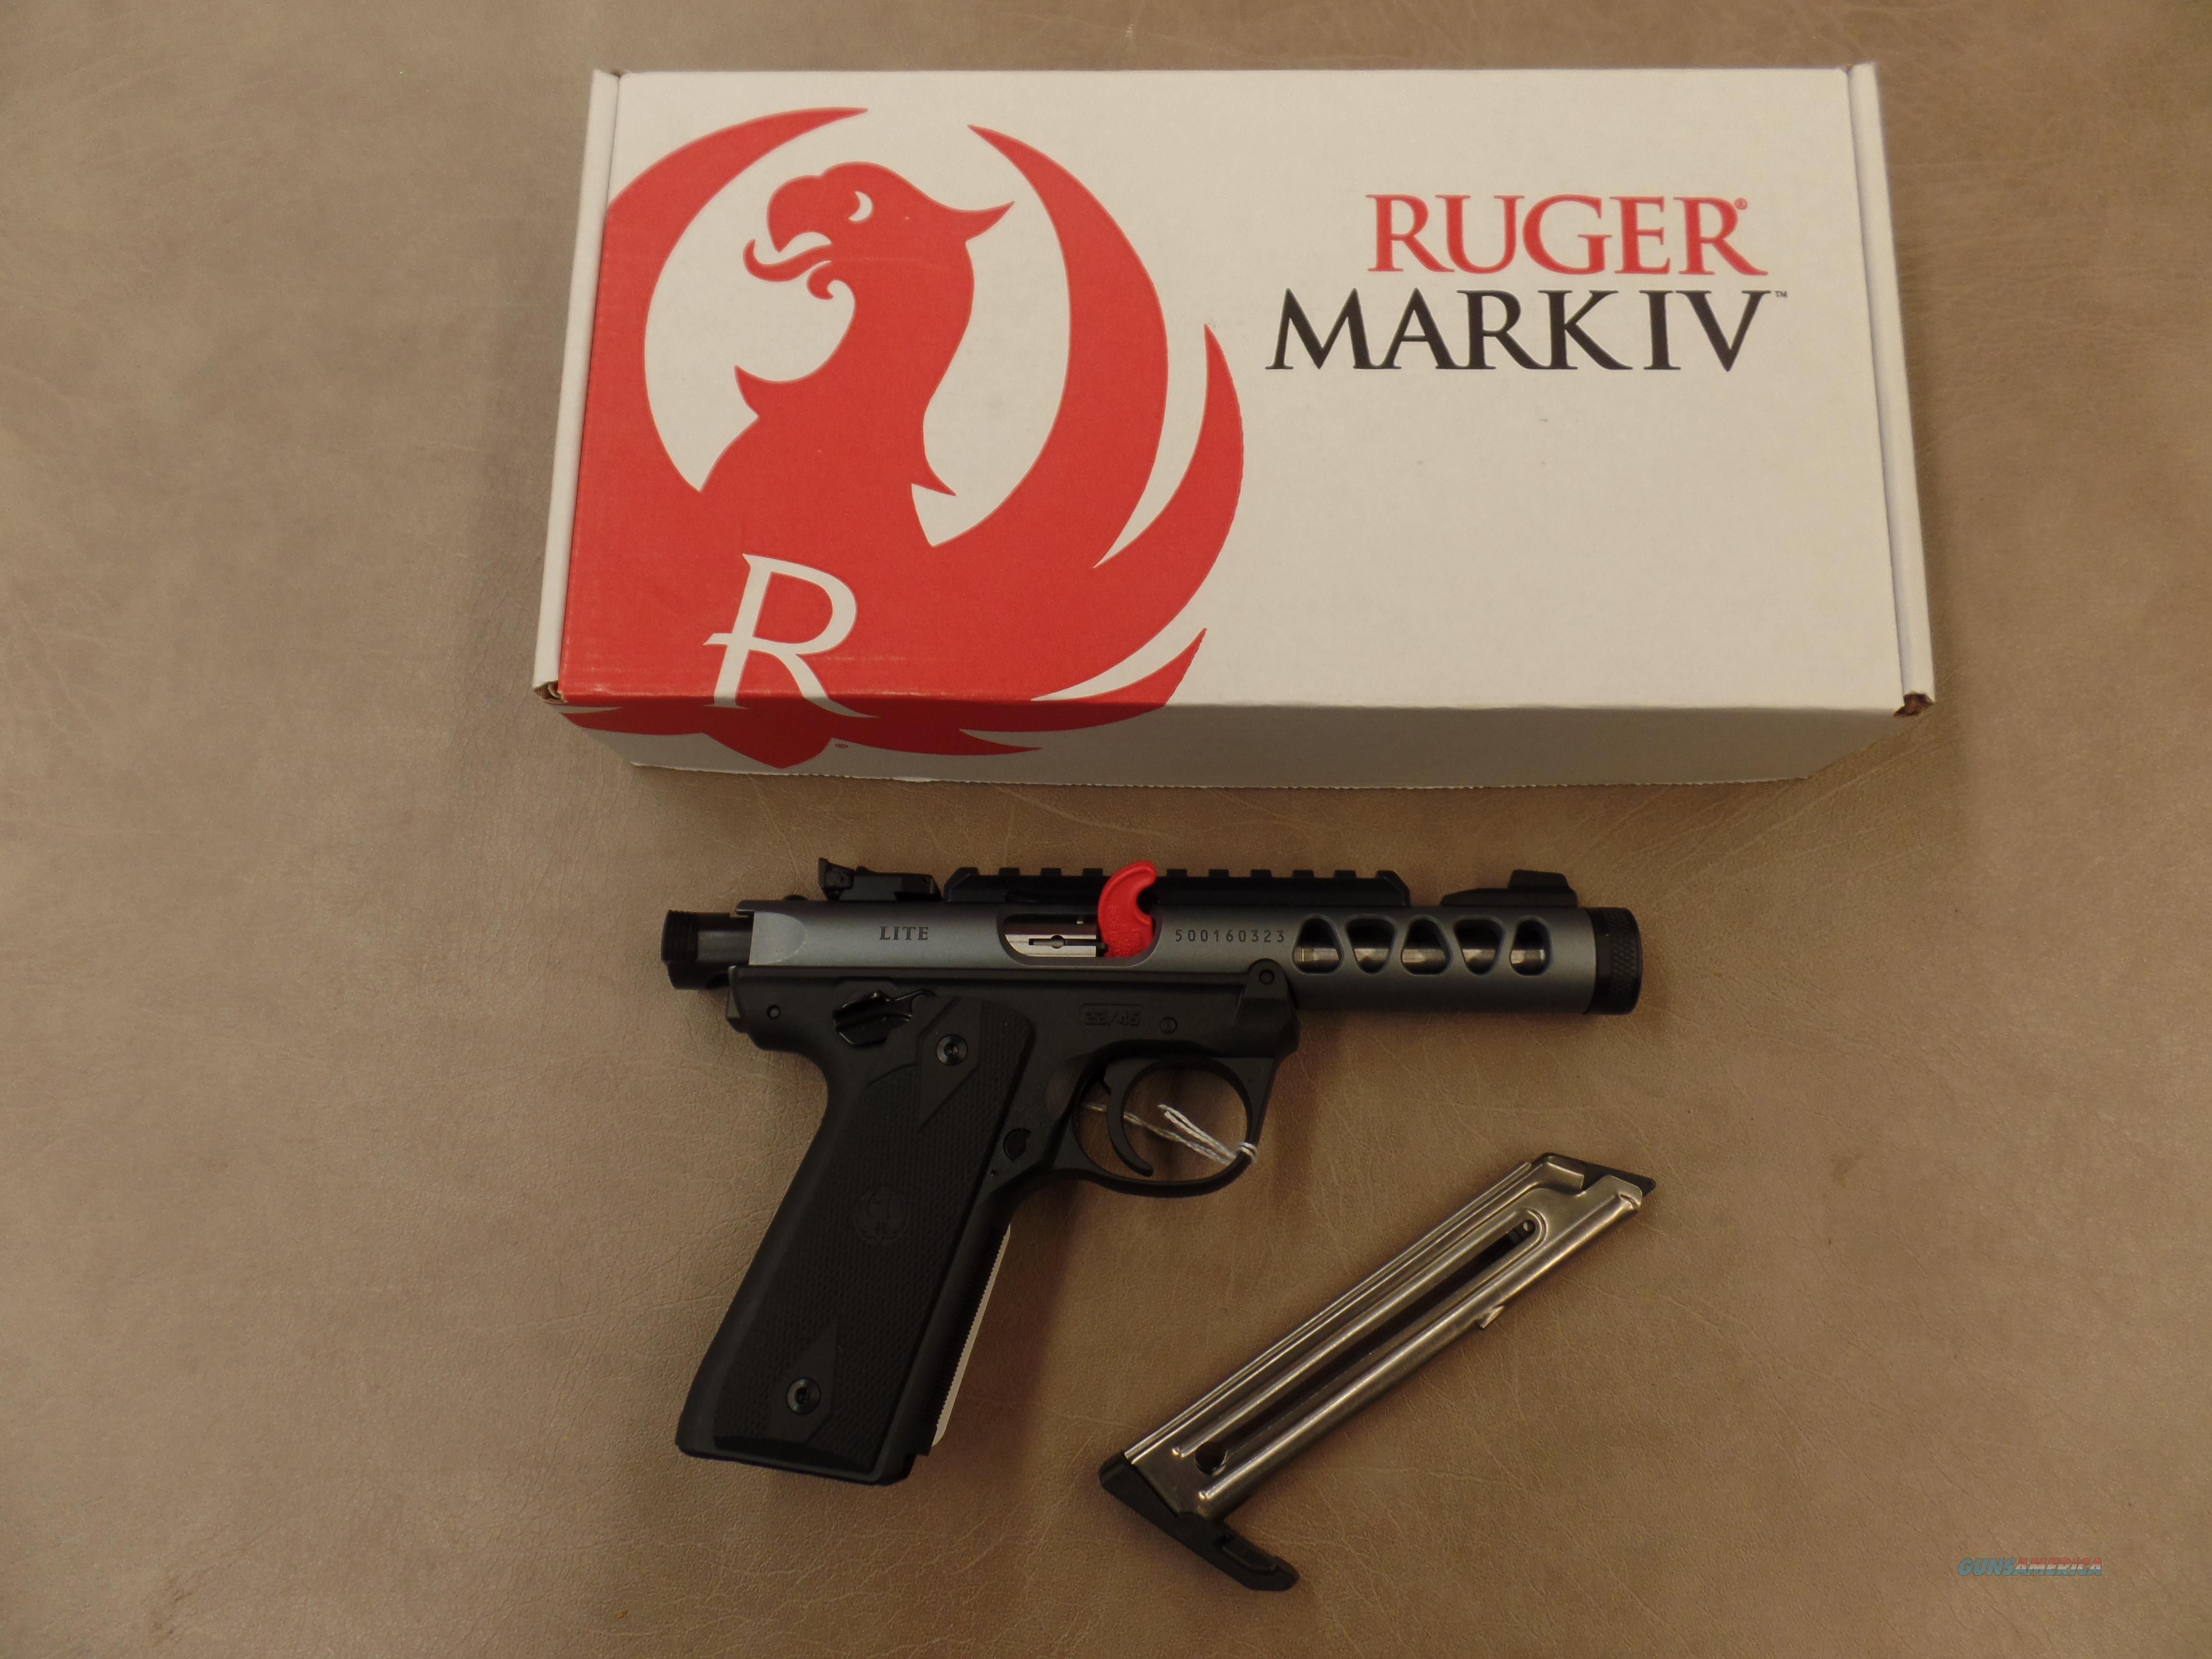 Ruger Mark IV 22/45 Lite NON Threaded Diamond Gray Anodized (22 LR)  Guns > Pistols > Ruger Semi-Auto Pistols > 22/45